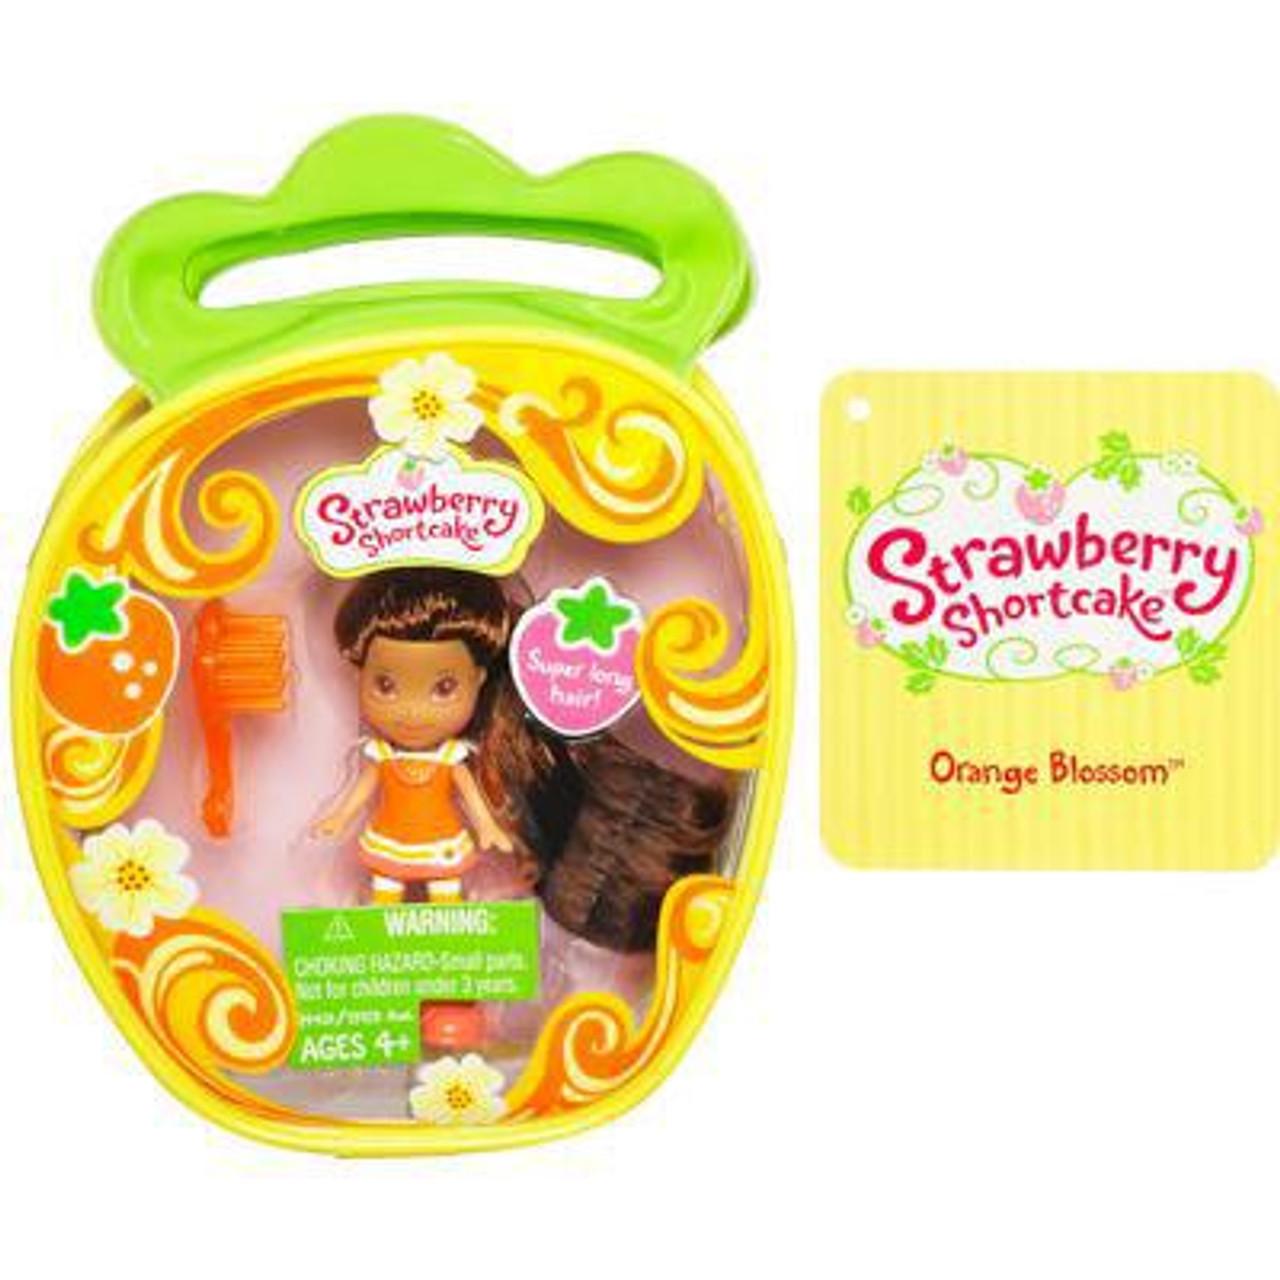 Strawberry Shortcake Orange Blossom Mini Doll [Version 3]